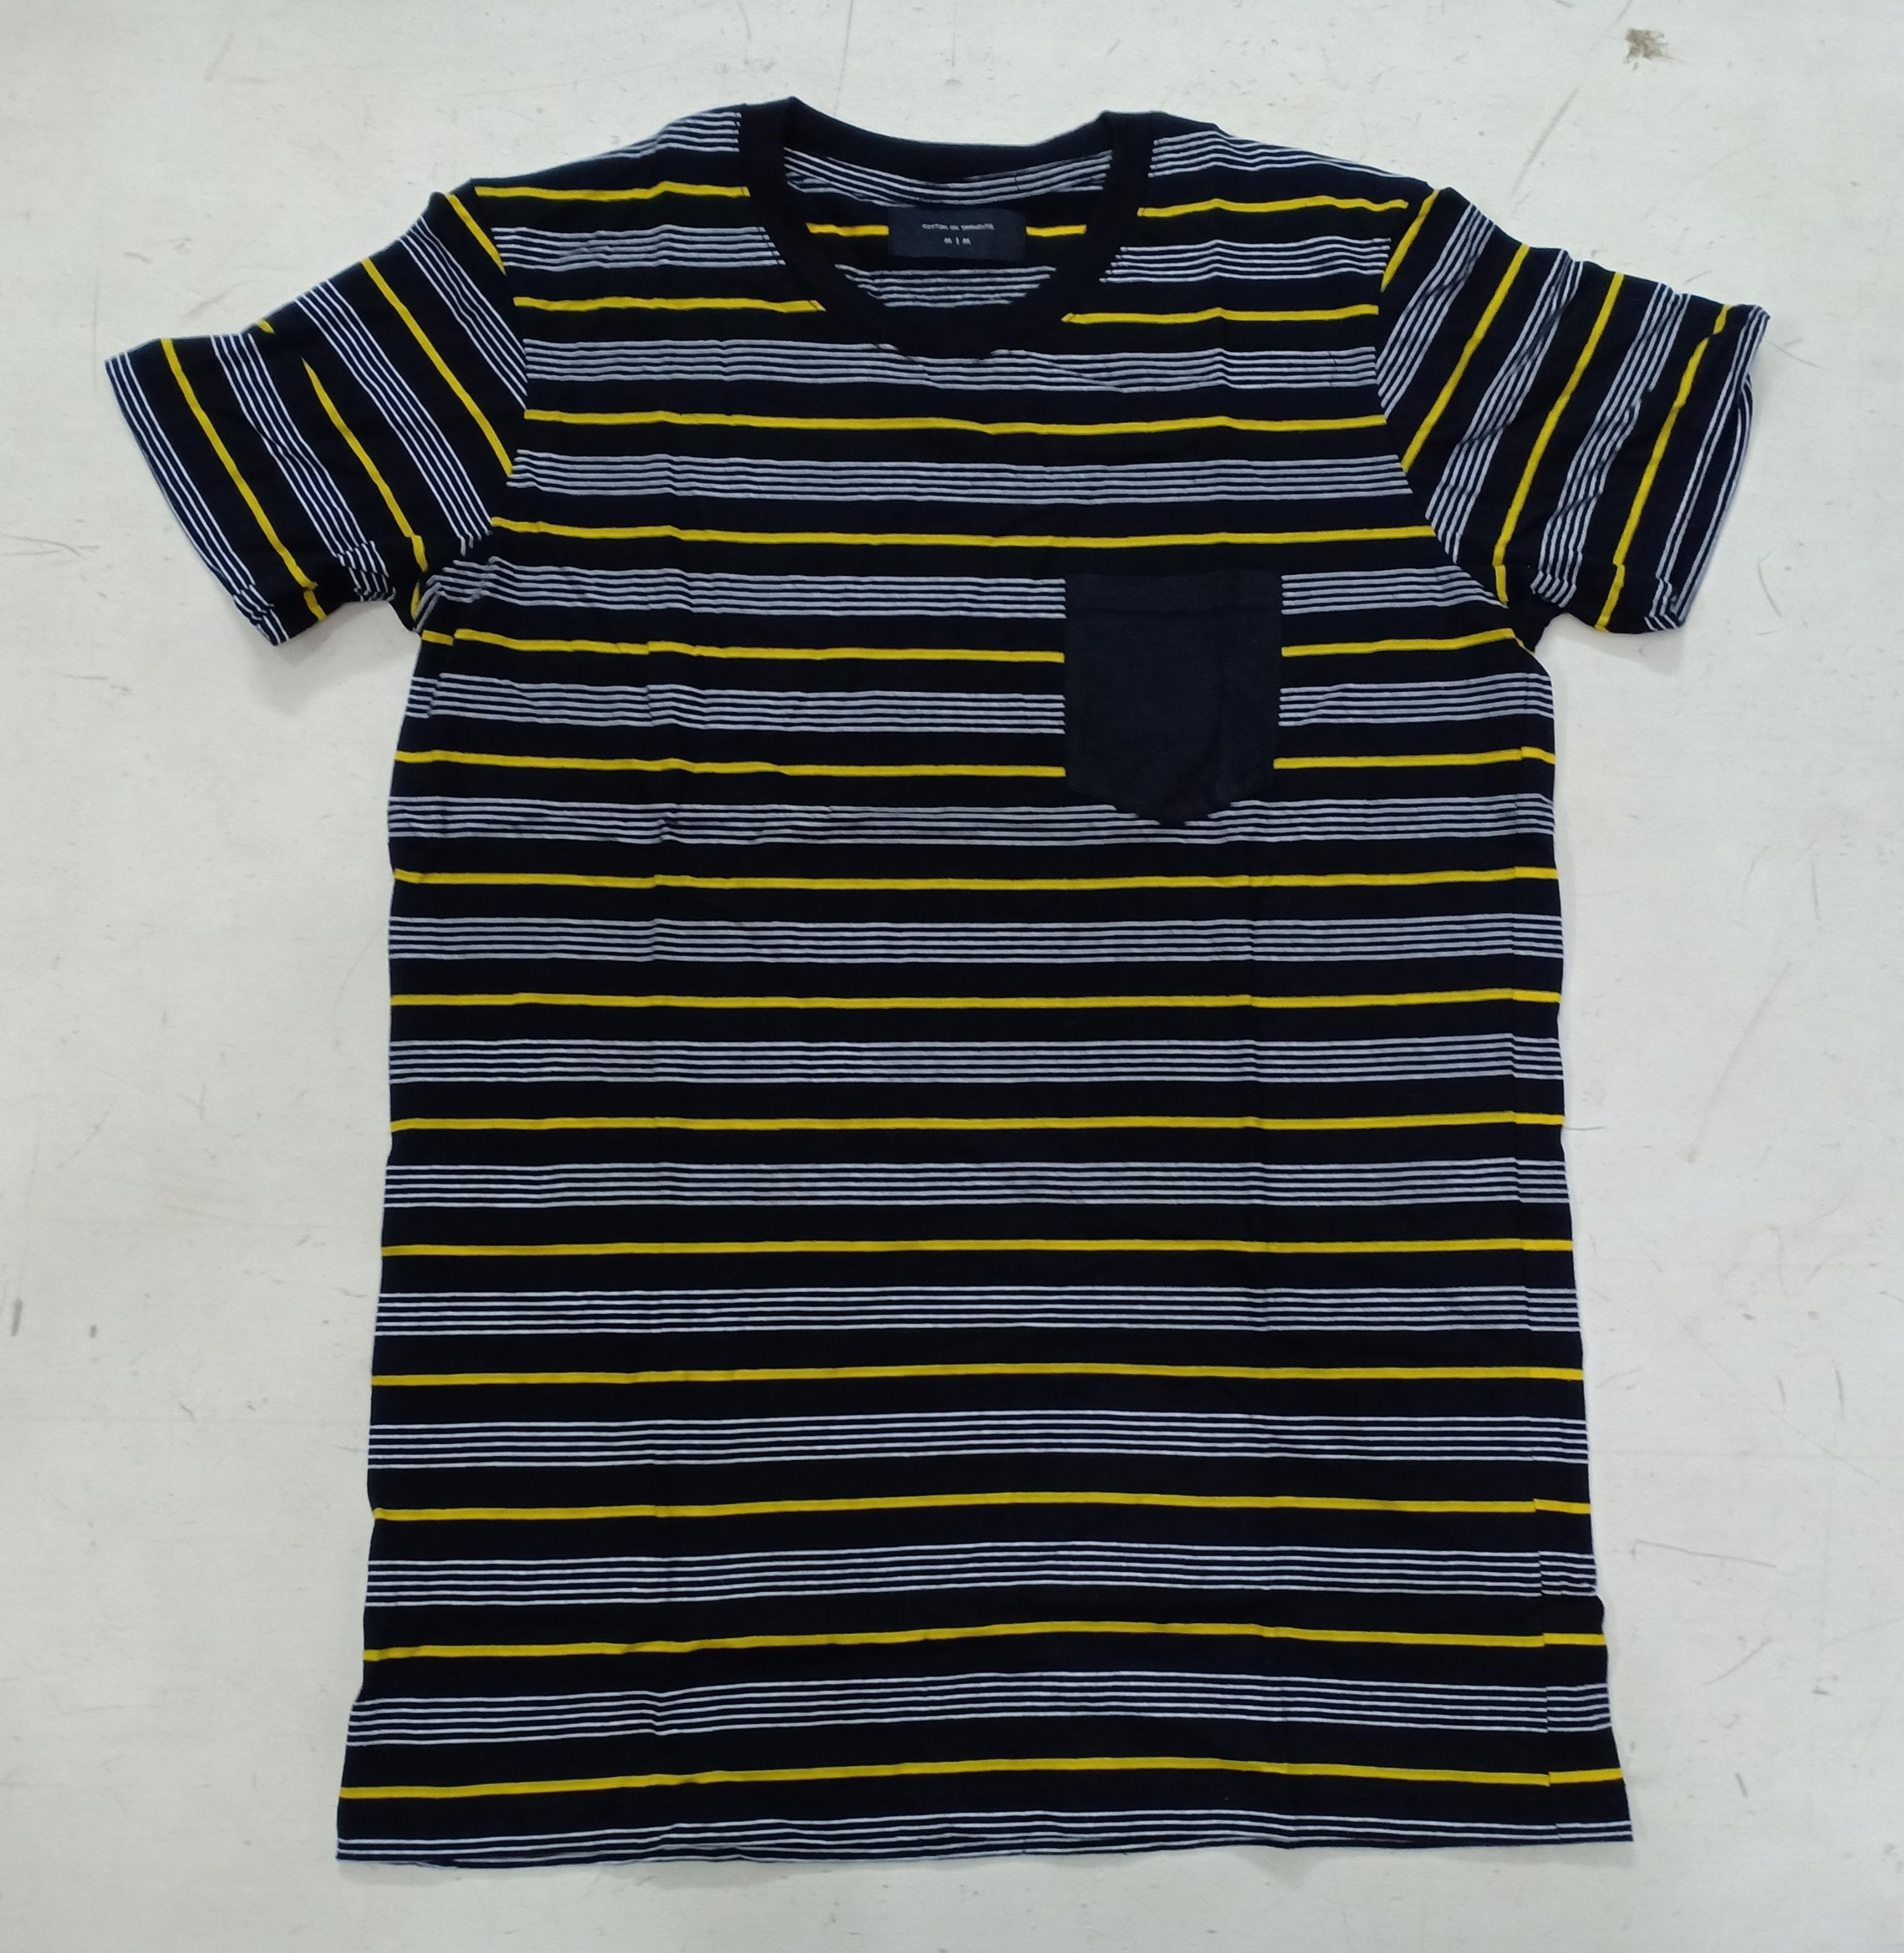 2a7404460 مصادر شركات تصنيع بنغلاديش الملابس بالجملة وبنغلاديش الملابس بالجملة في  Alibaba.com